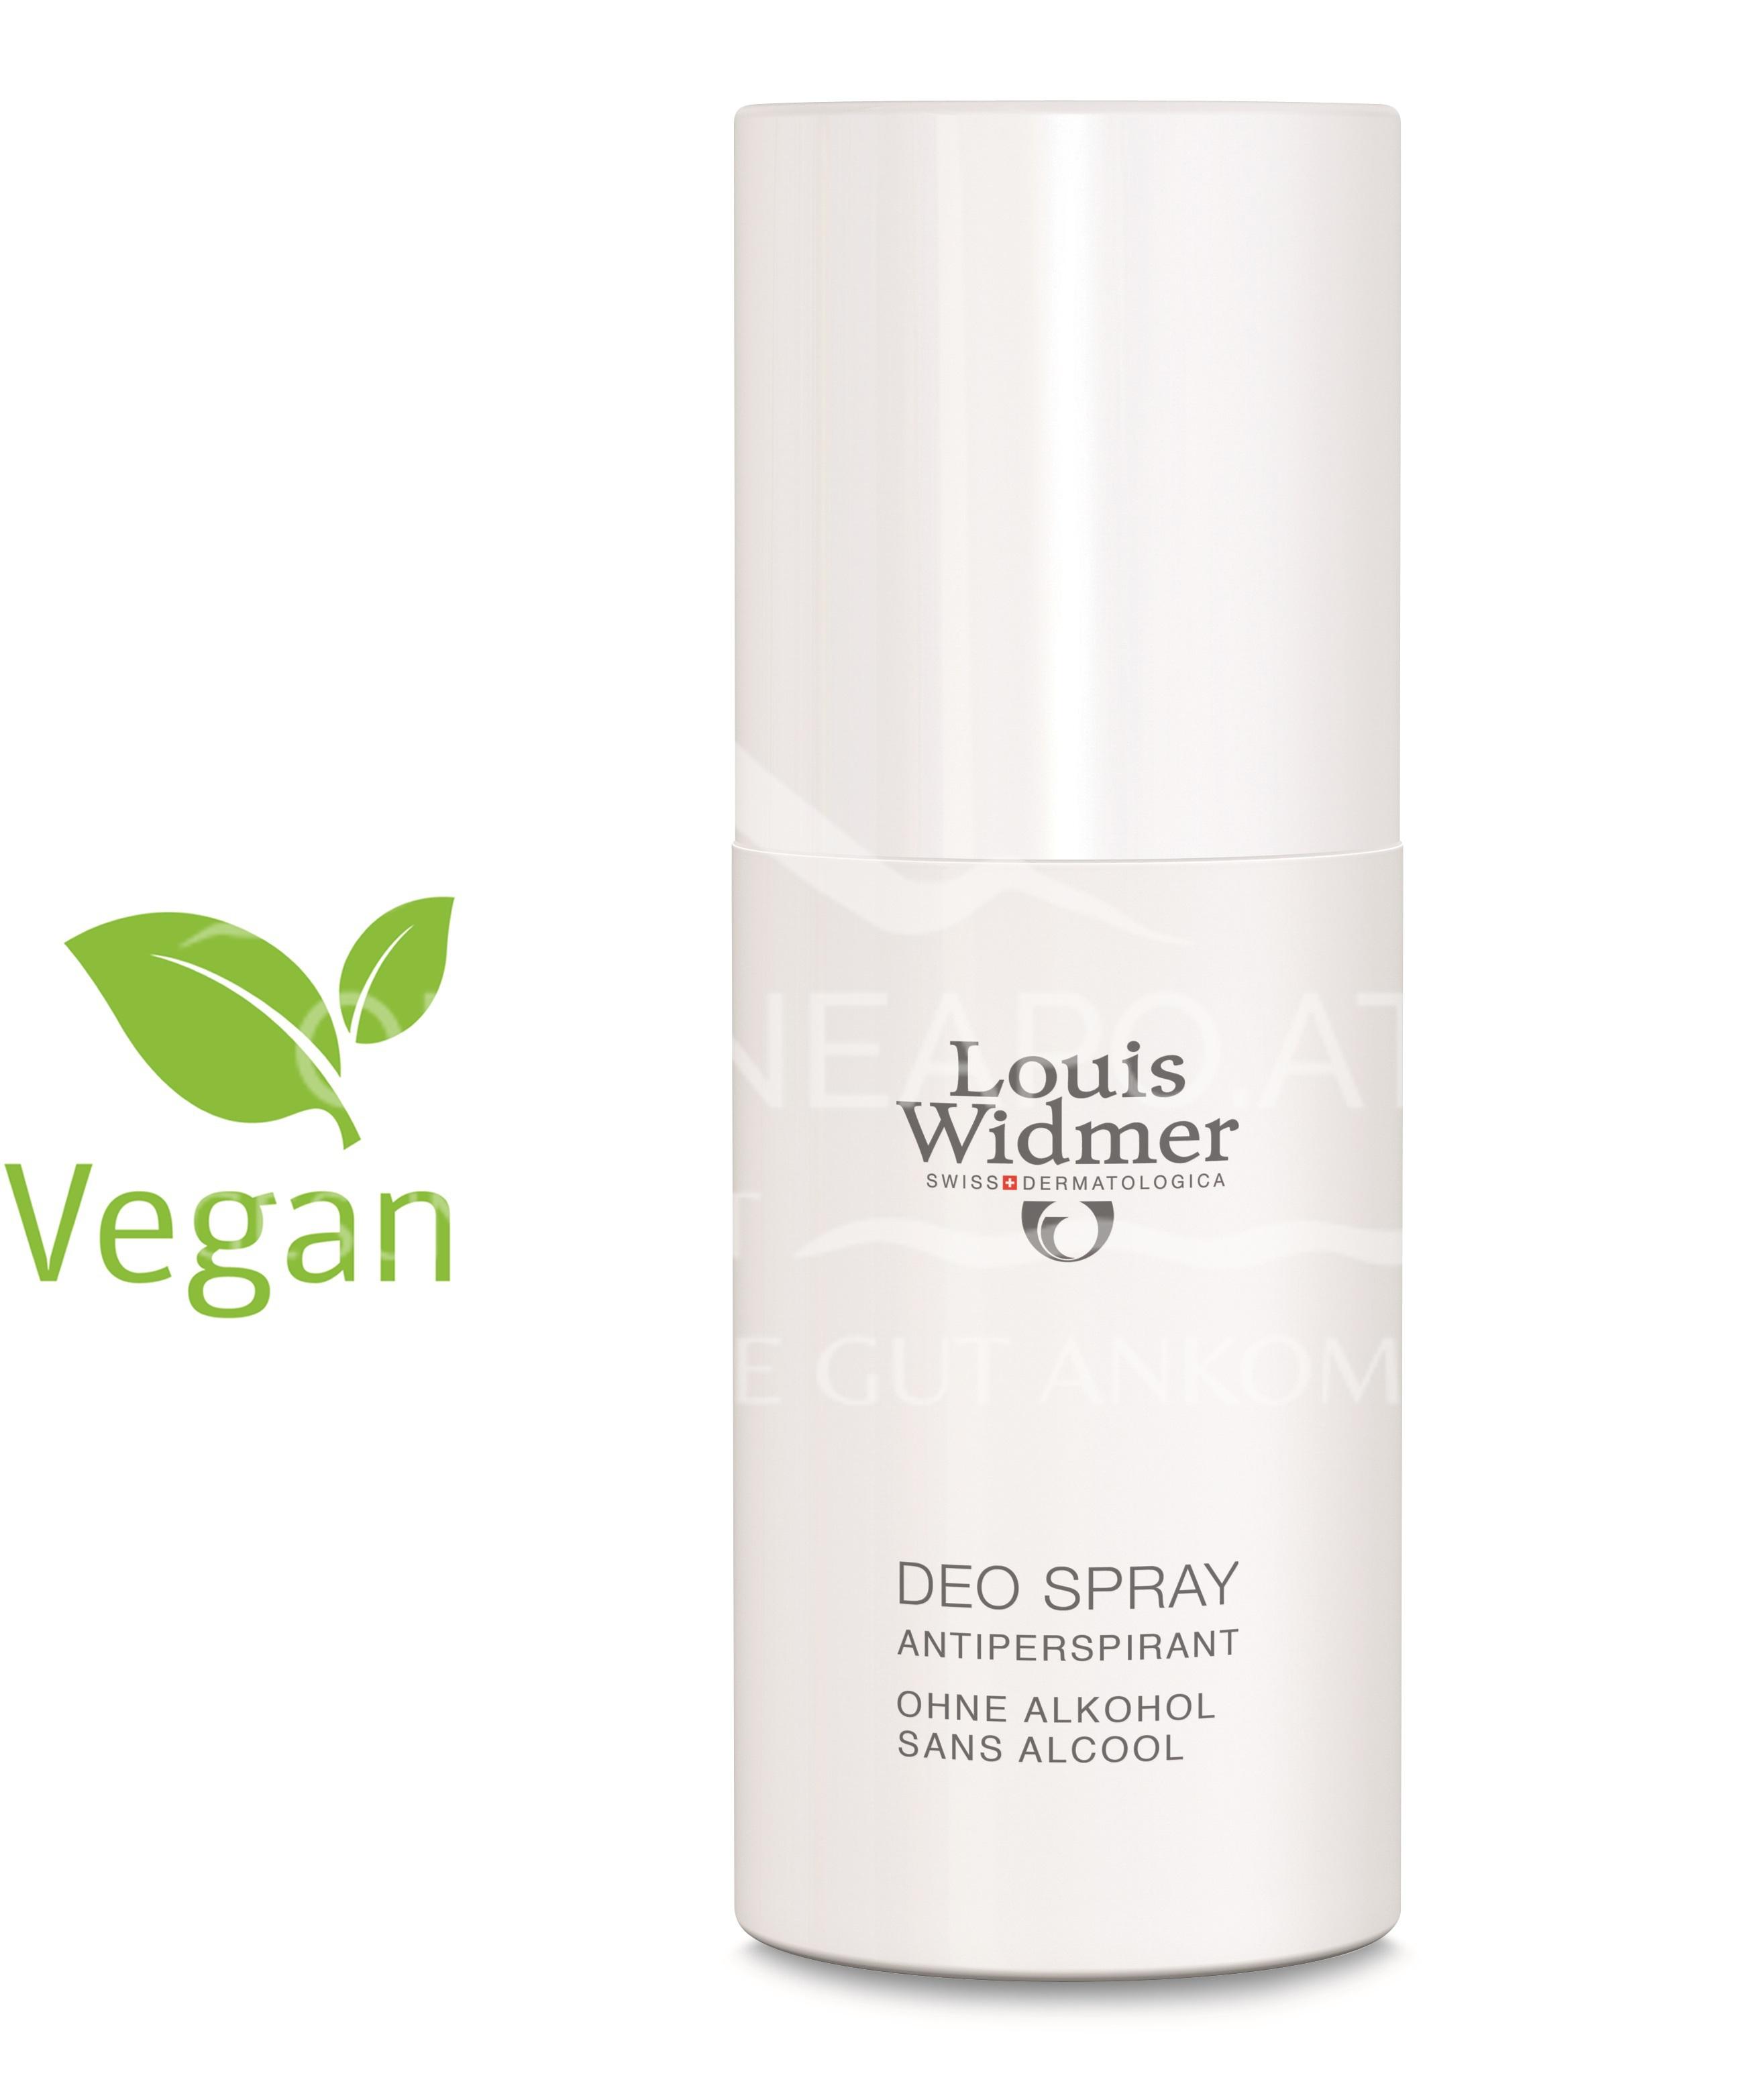 Louis Widmer Deo Spray Antiperspirant